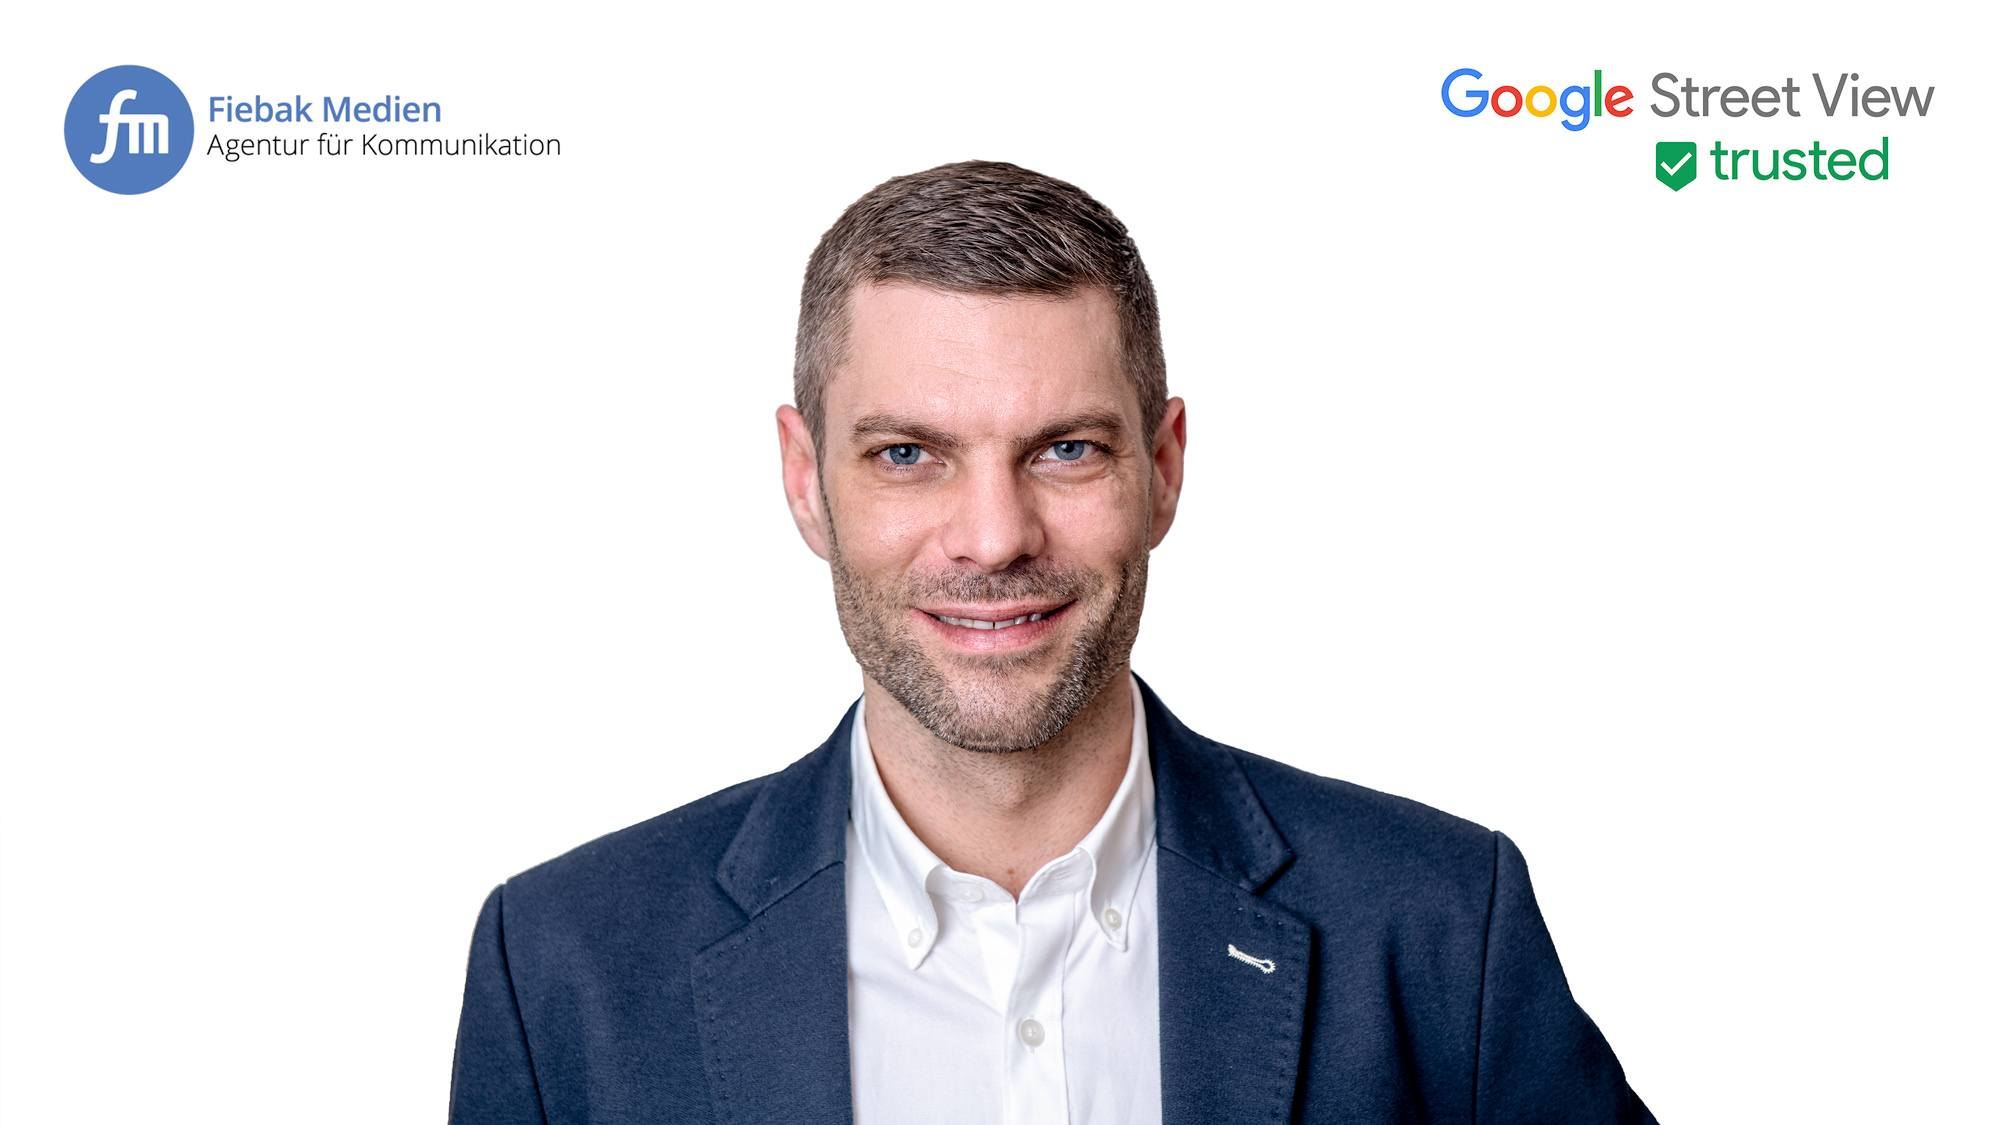 Sebastian Fiebak Google Street View zertifizierter Fotograf